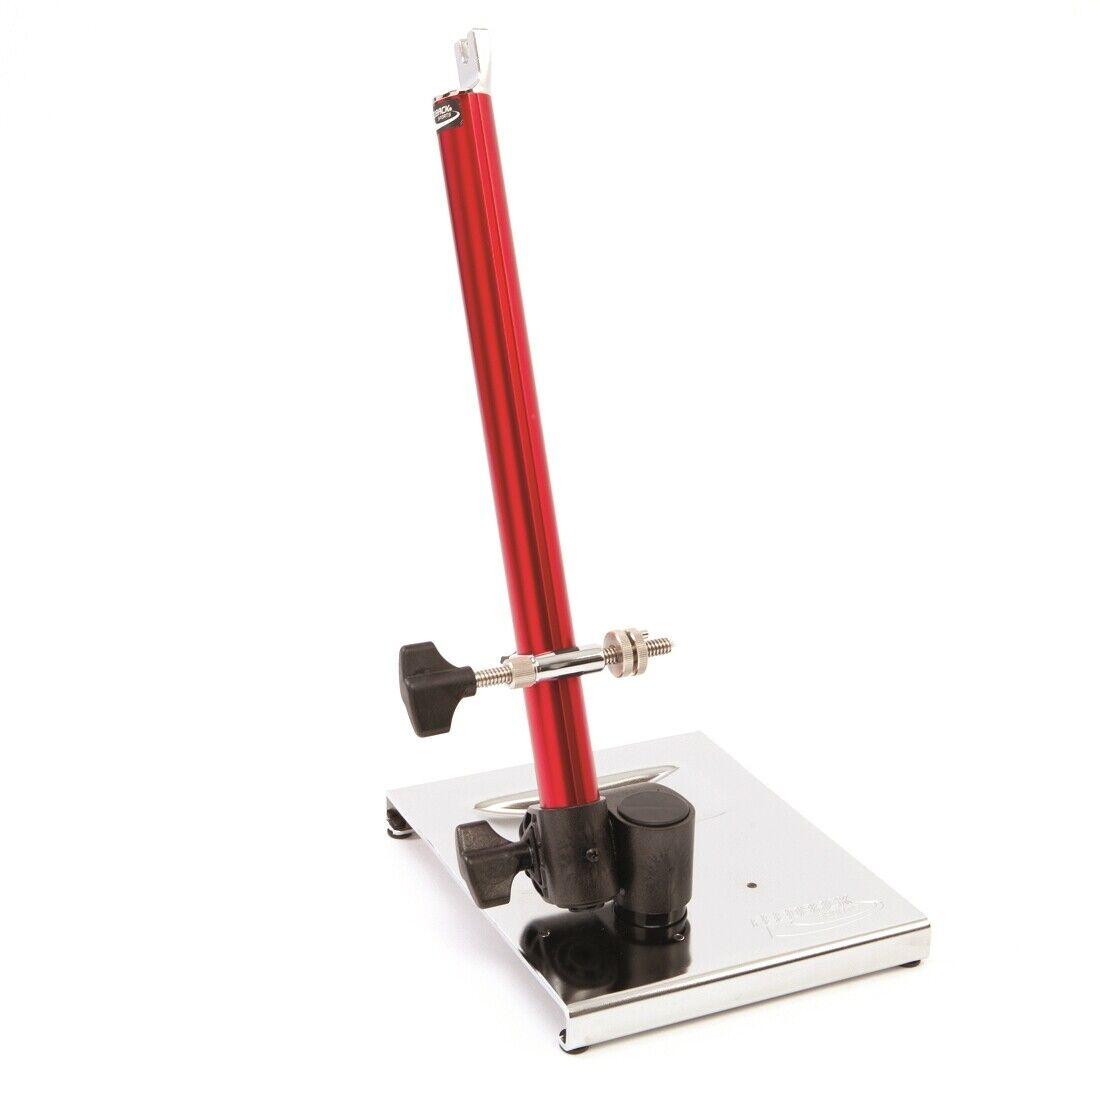 Feedback Sports Pro Single Arm Wheel Truing Stand